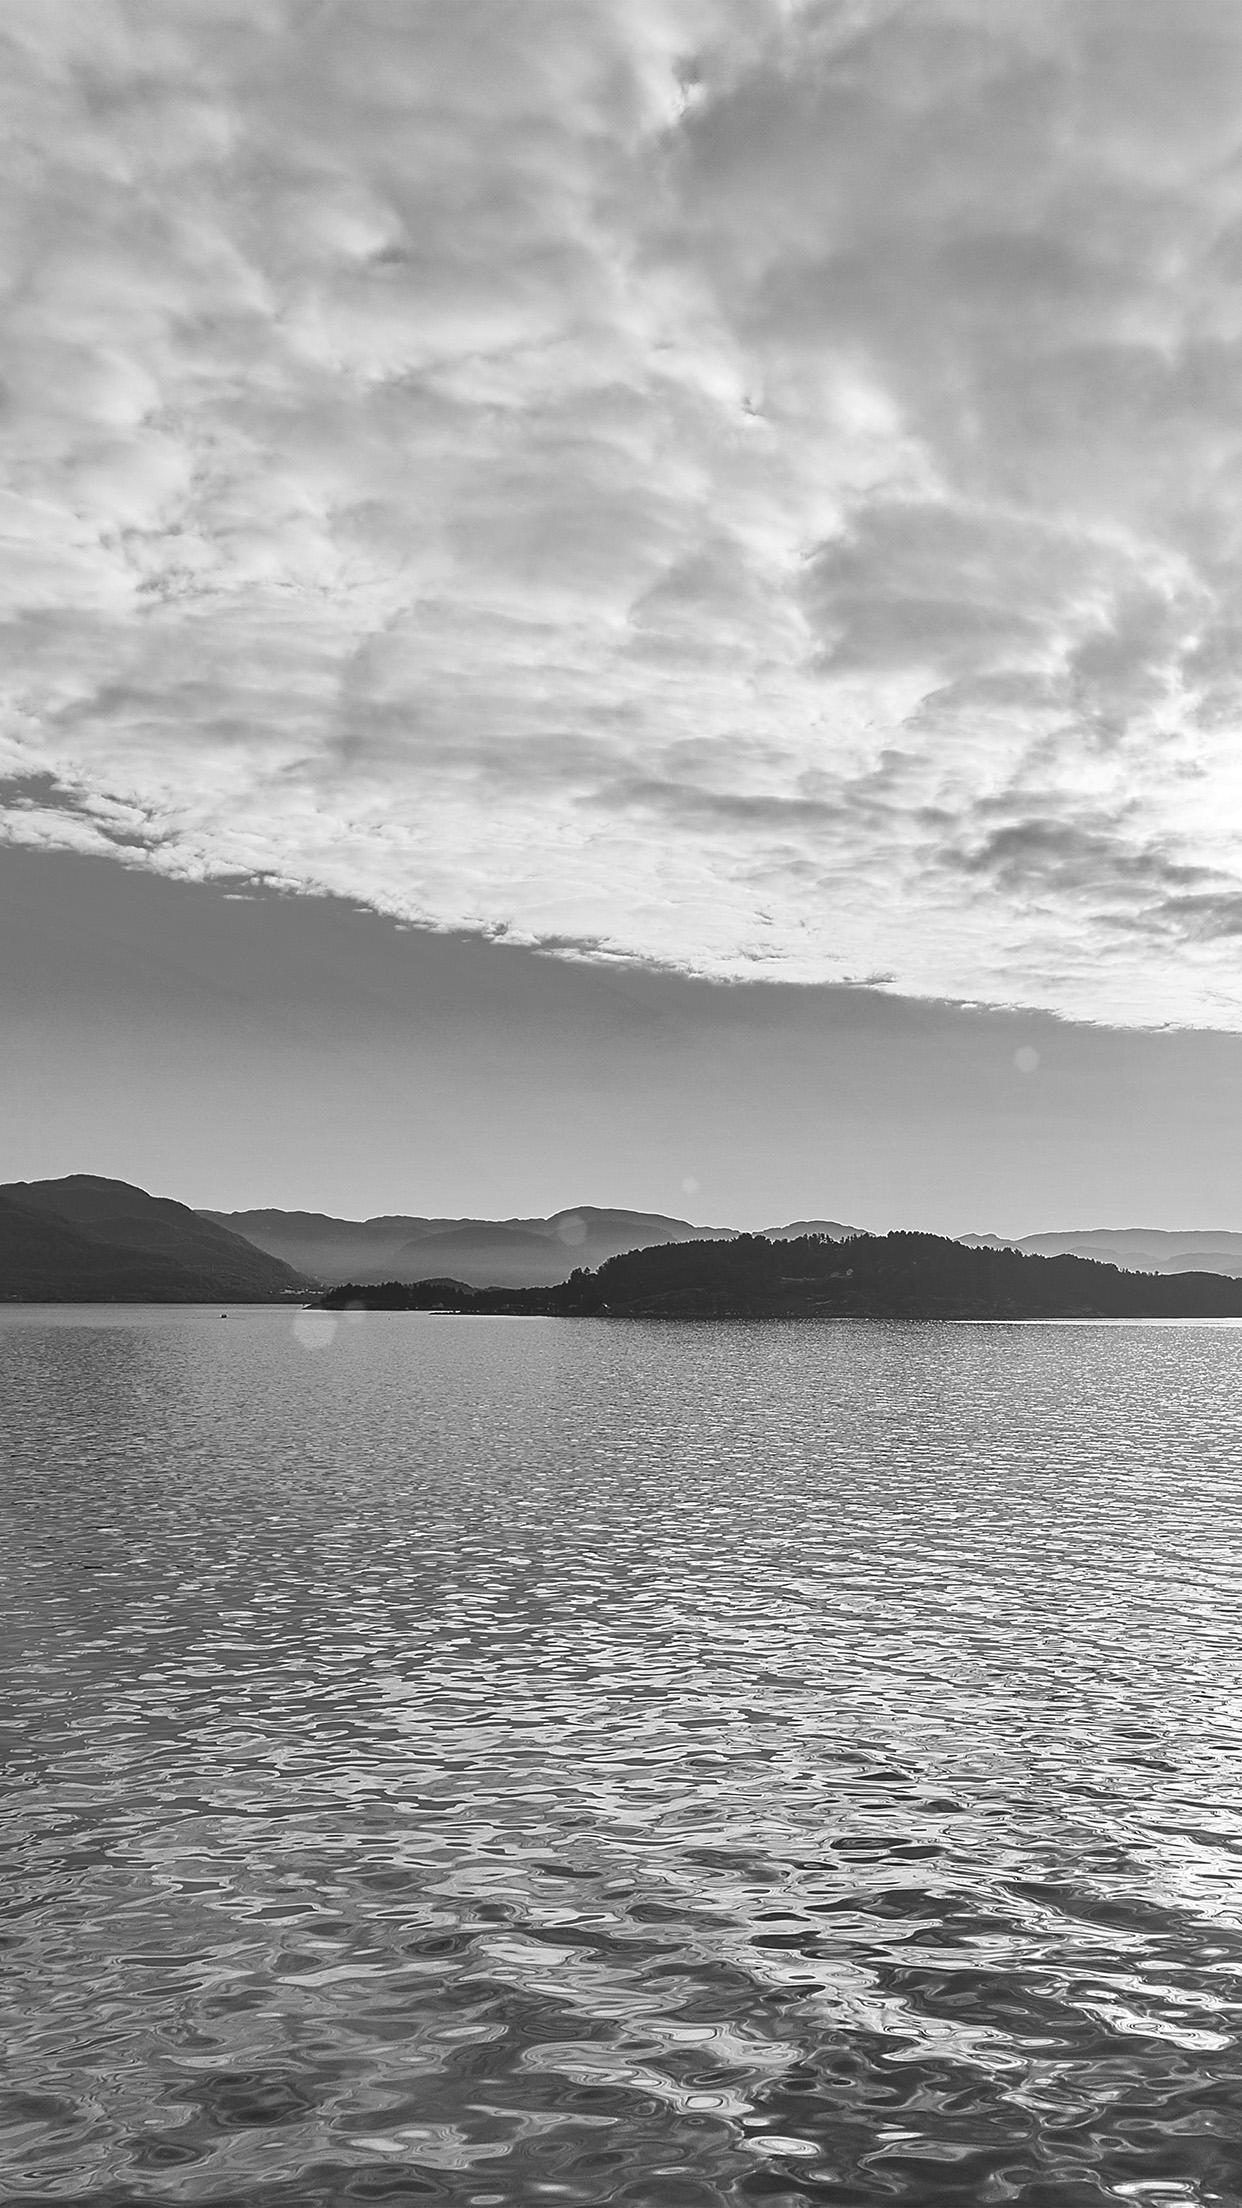 Iphonexpapers Com Iphone X Wallpaper My56 Lake Mountain Summer Nature Blue Healing Cloud Bw